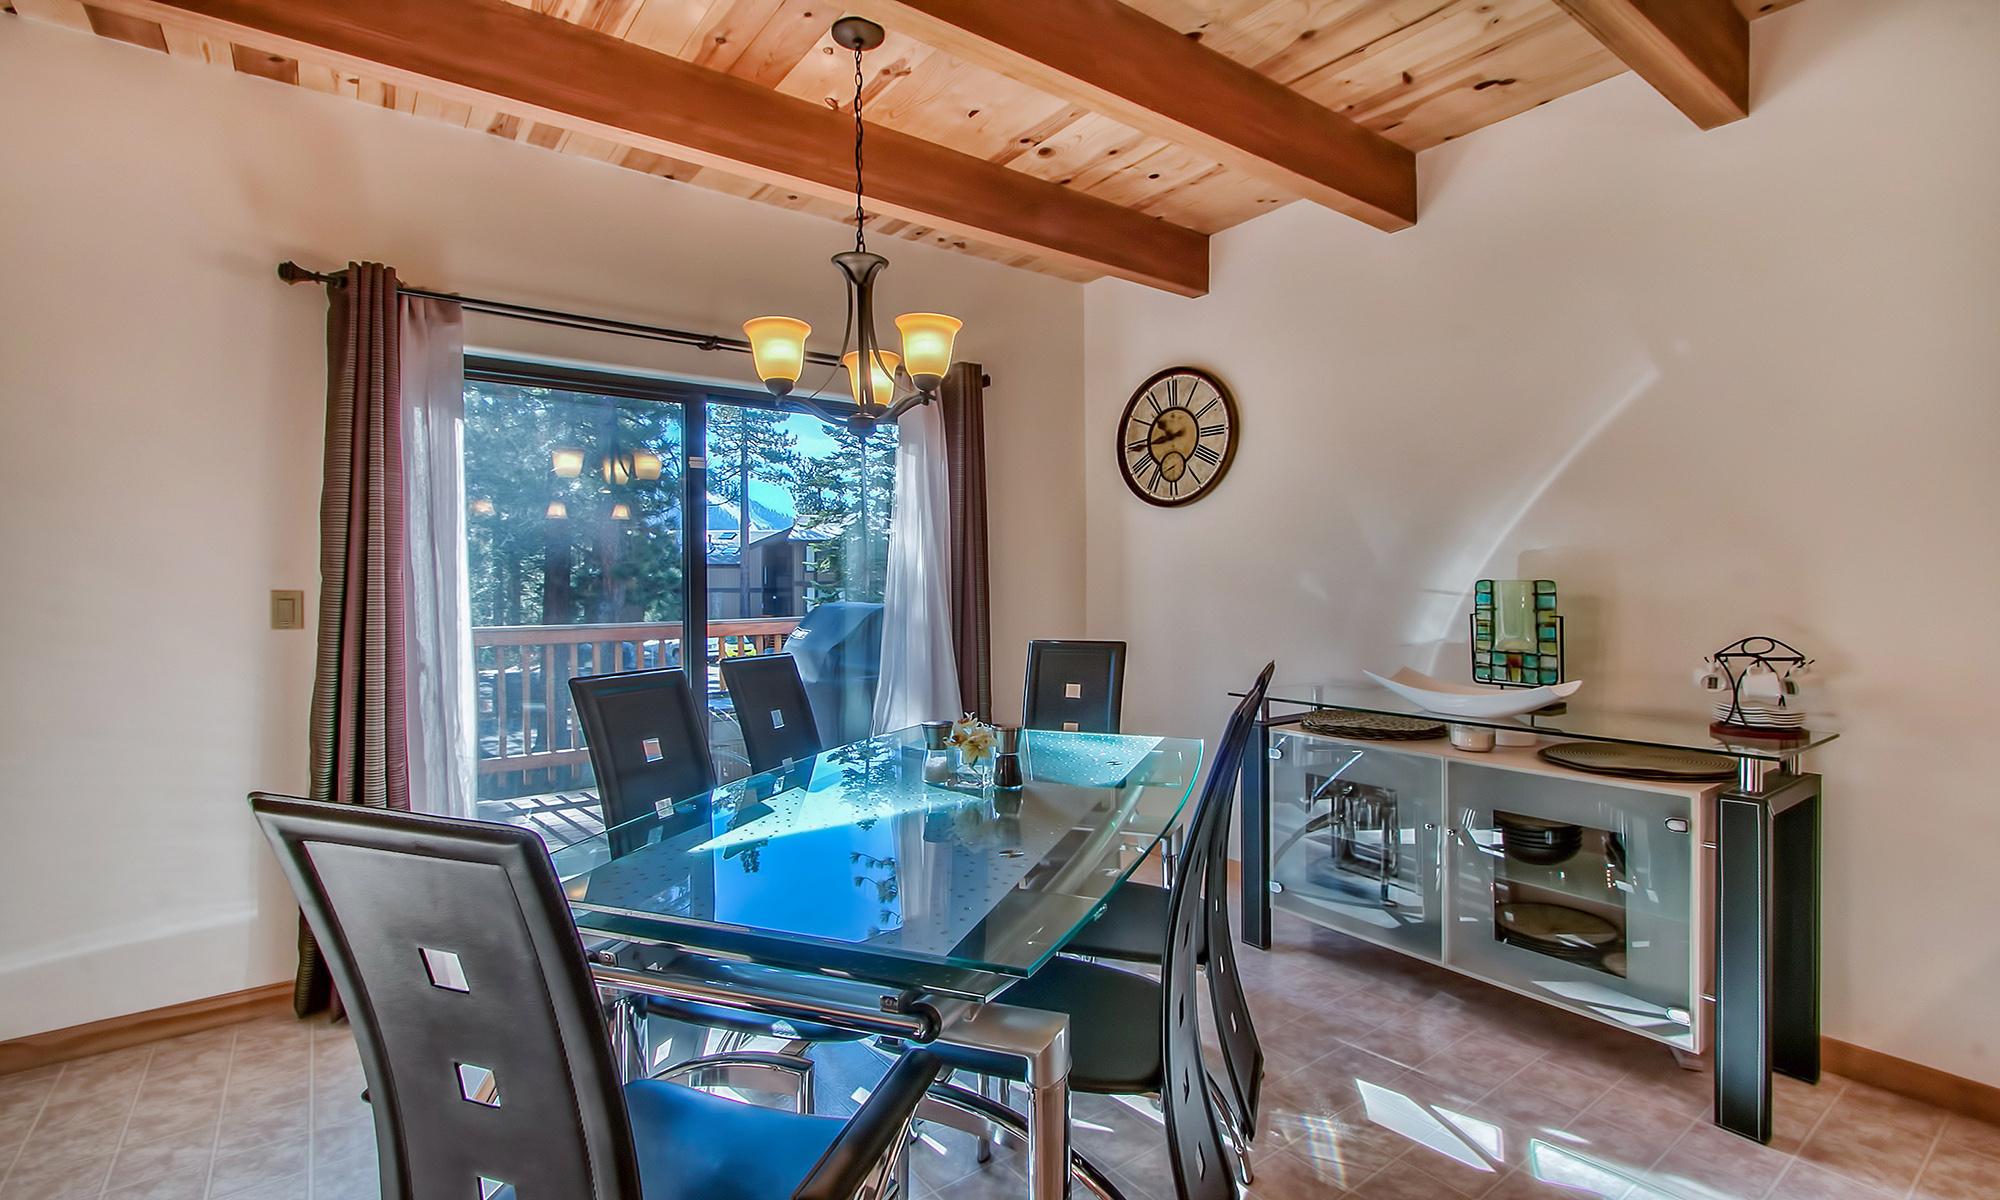 Townhouse for Sale at 20 Manzanita Court Stateline, Nevada 89449 United States